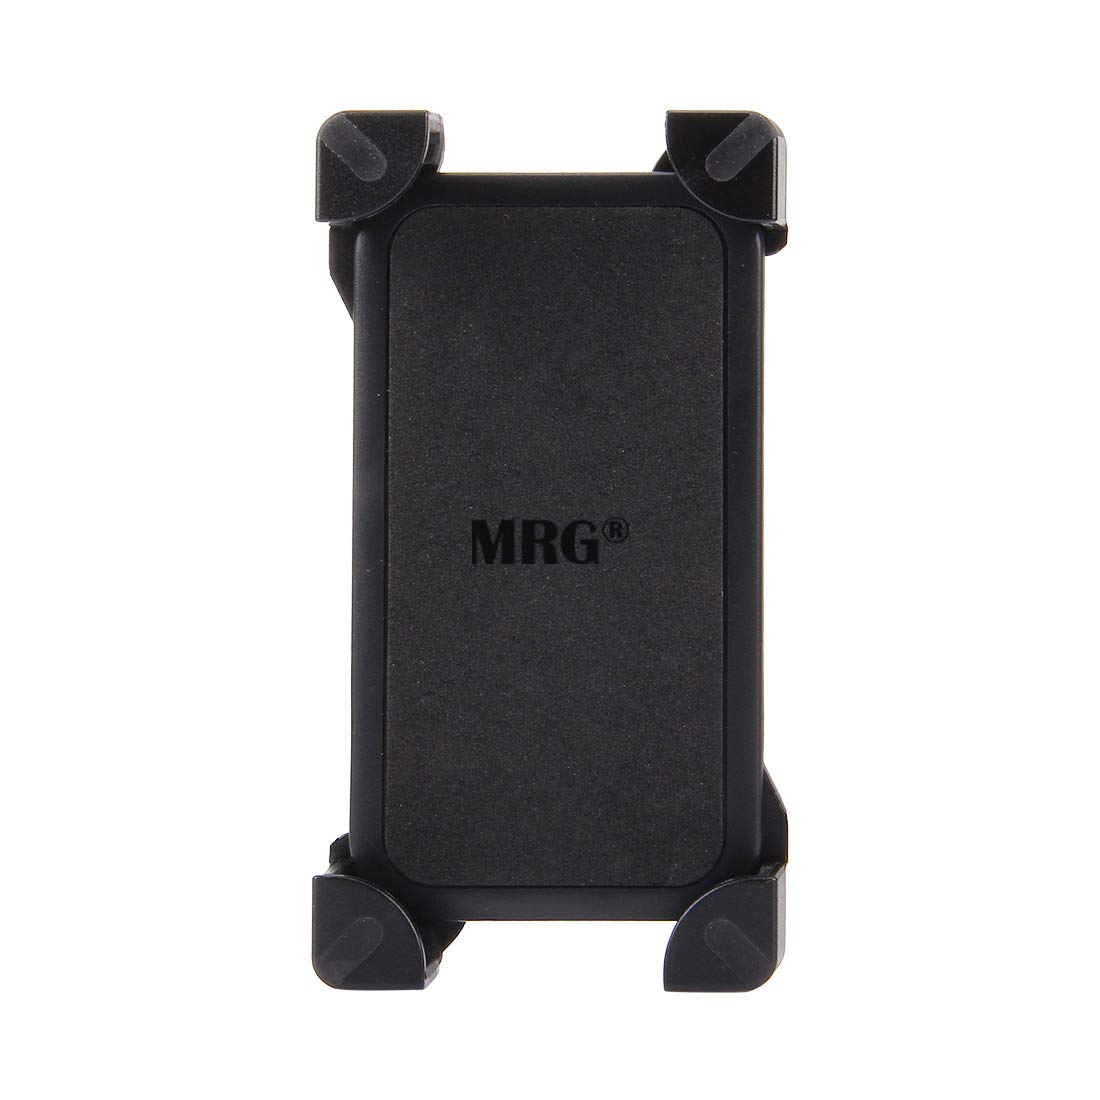 Suport Telefon MRG L-CH01, Pentru bicicleta, Ajustabil, Negru